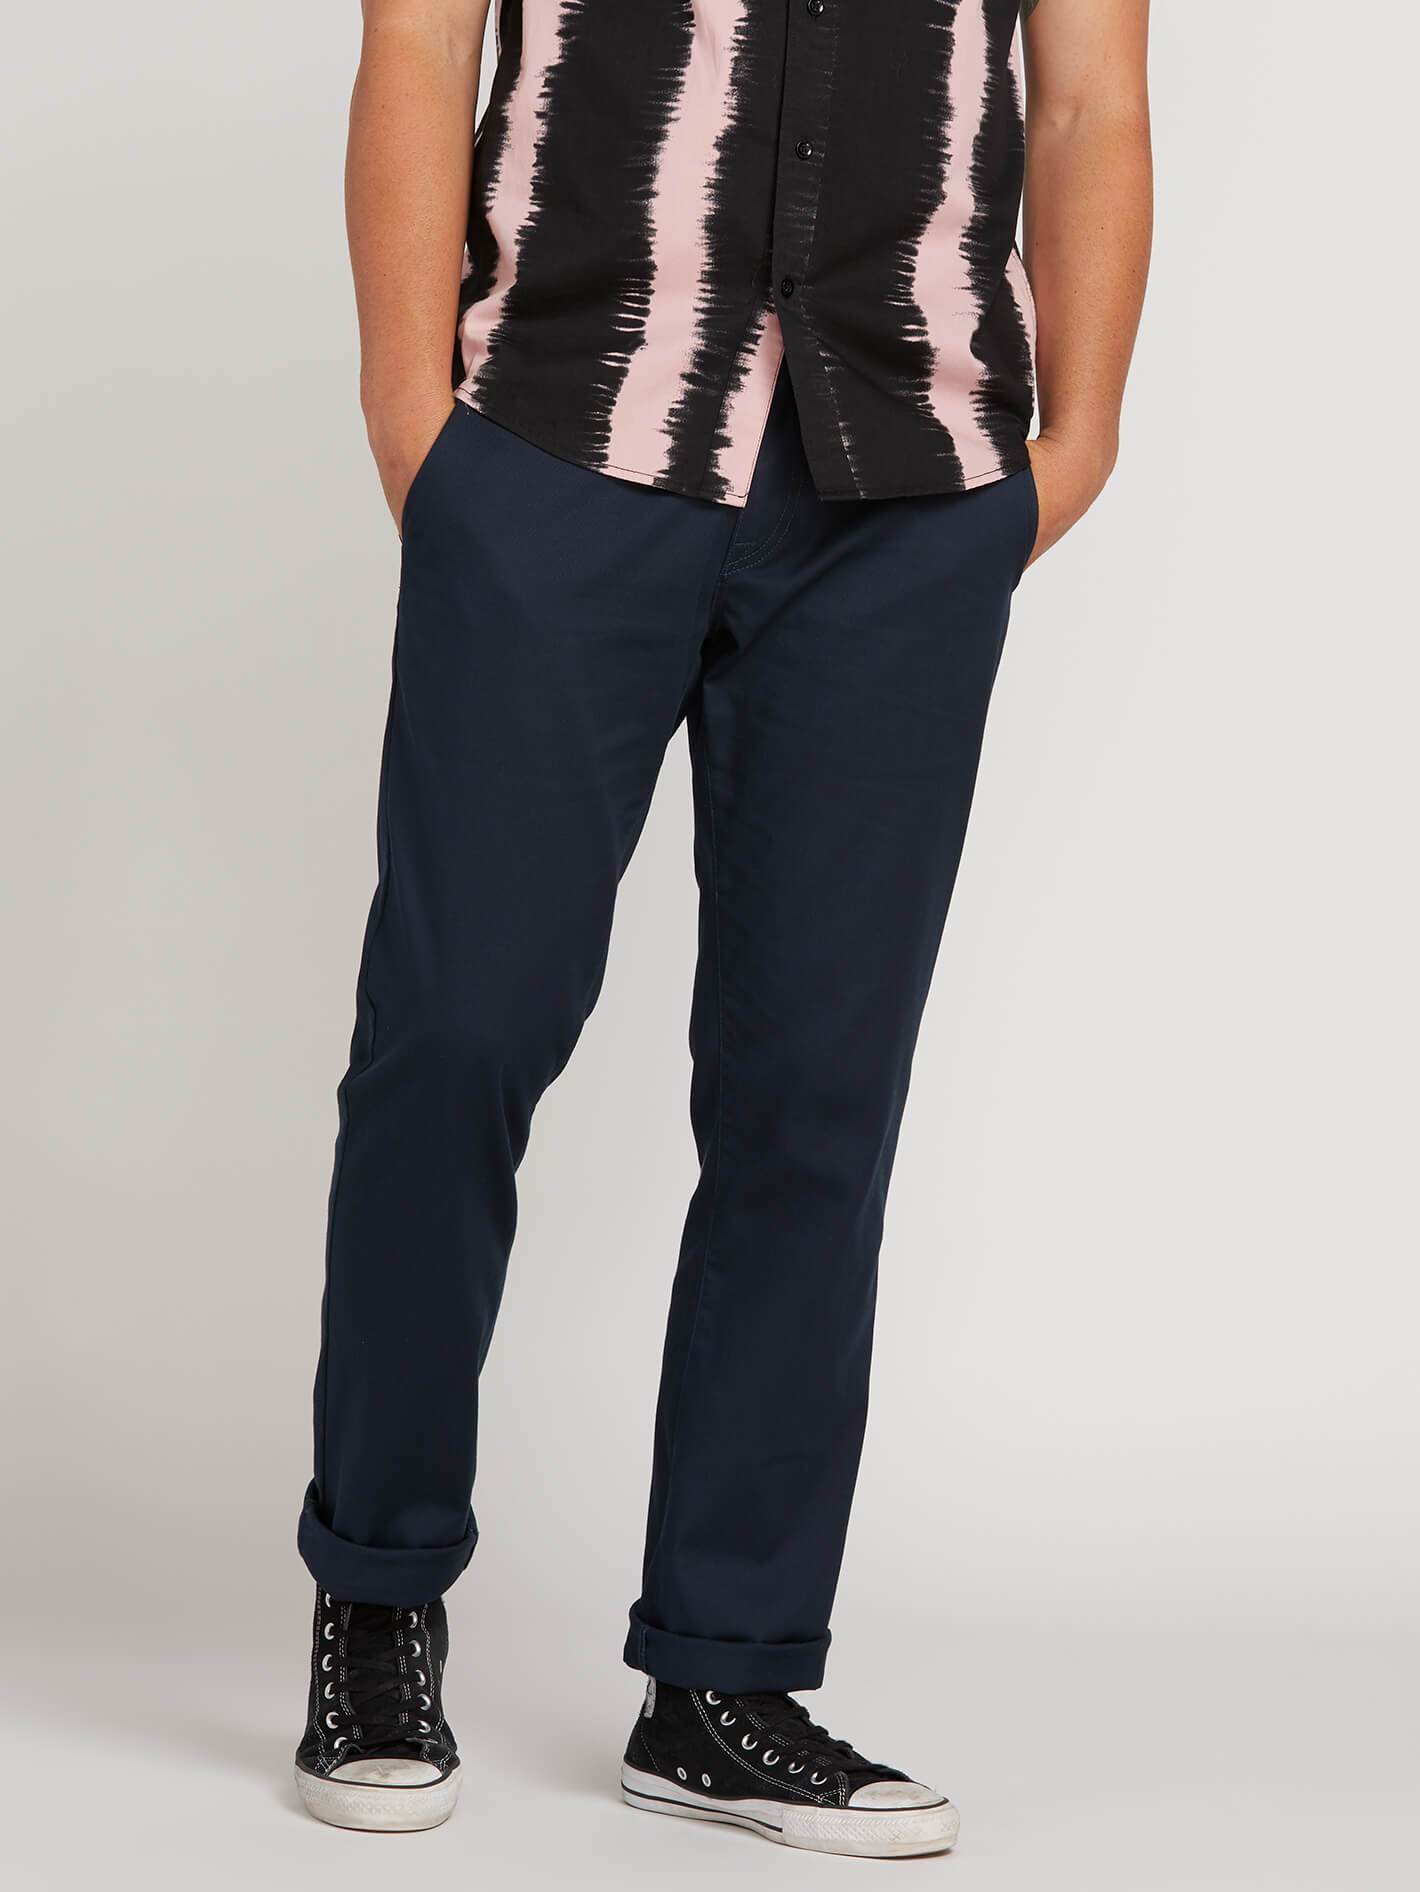 Frickin Modern Stretch Chino Pants - Dark Navy - DARK NAVY / 30 / 32